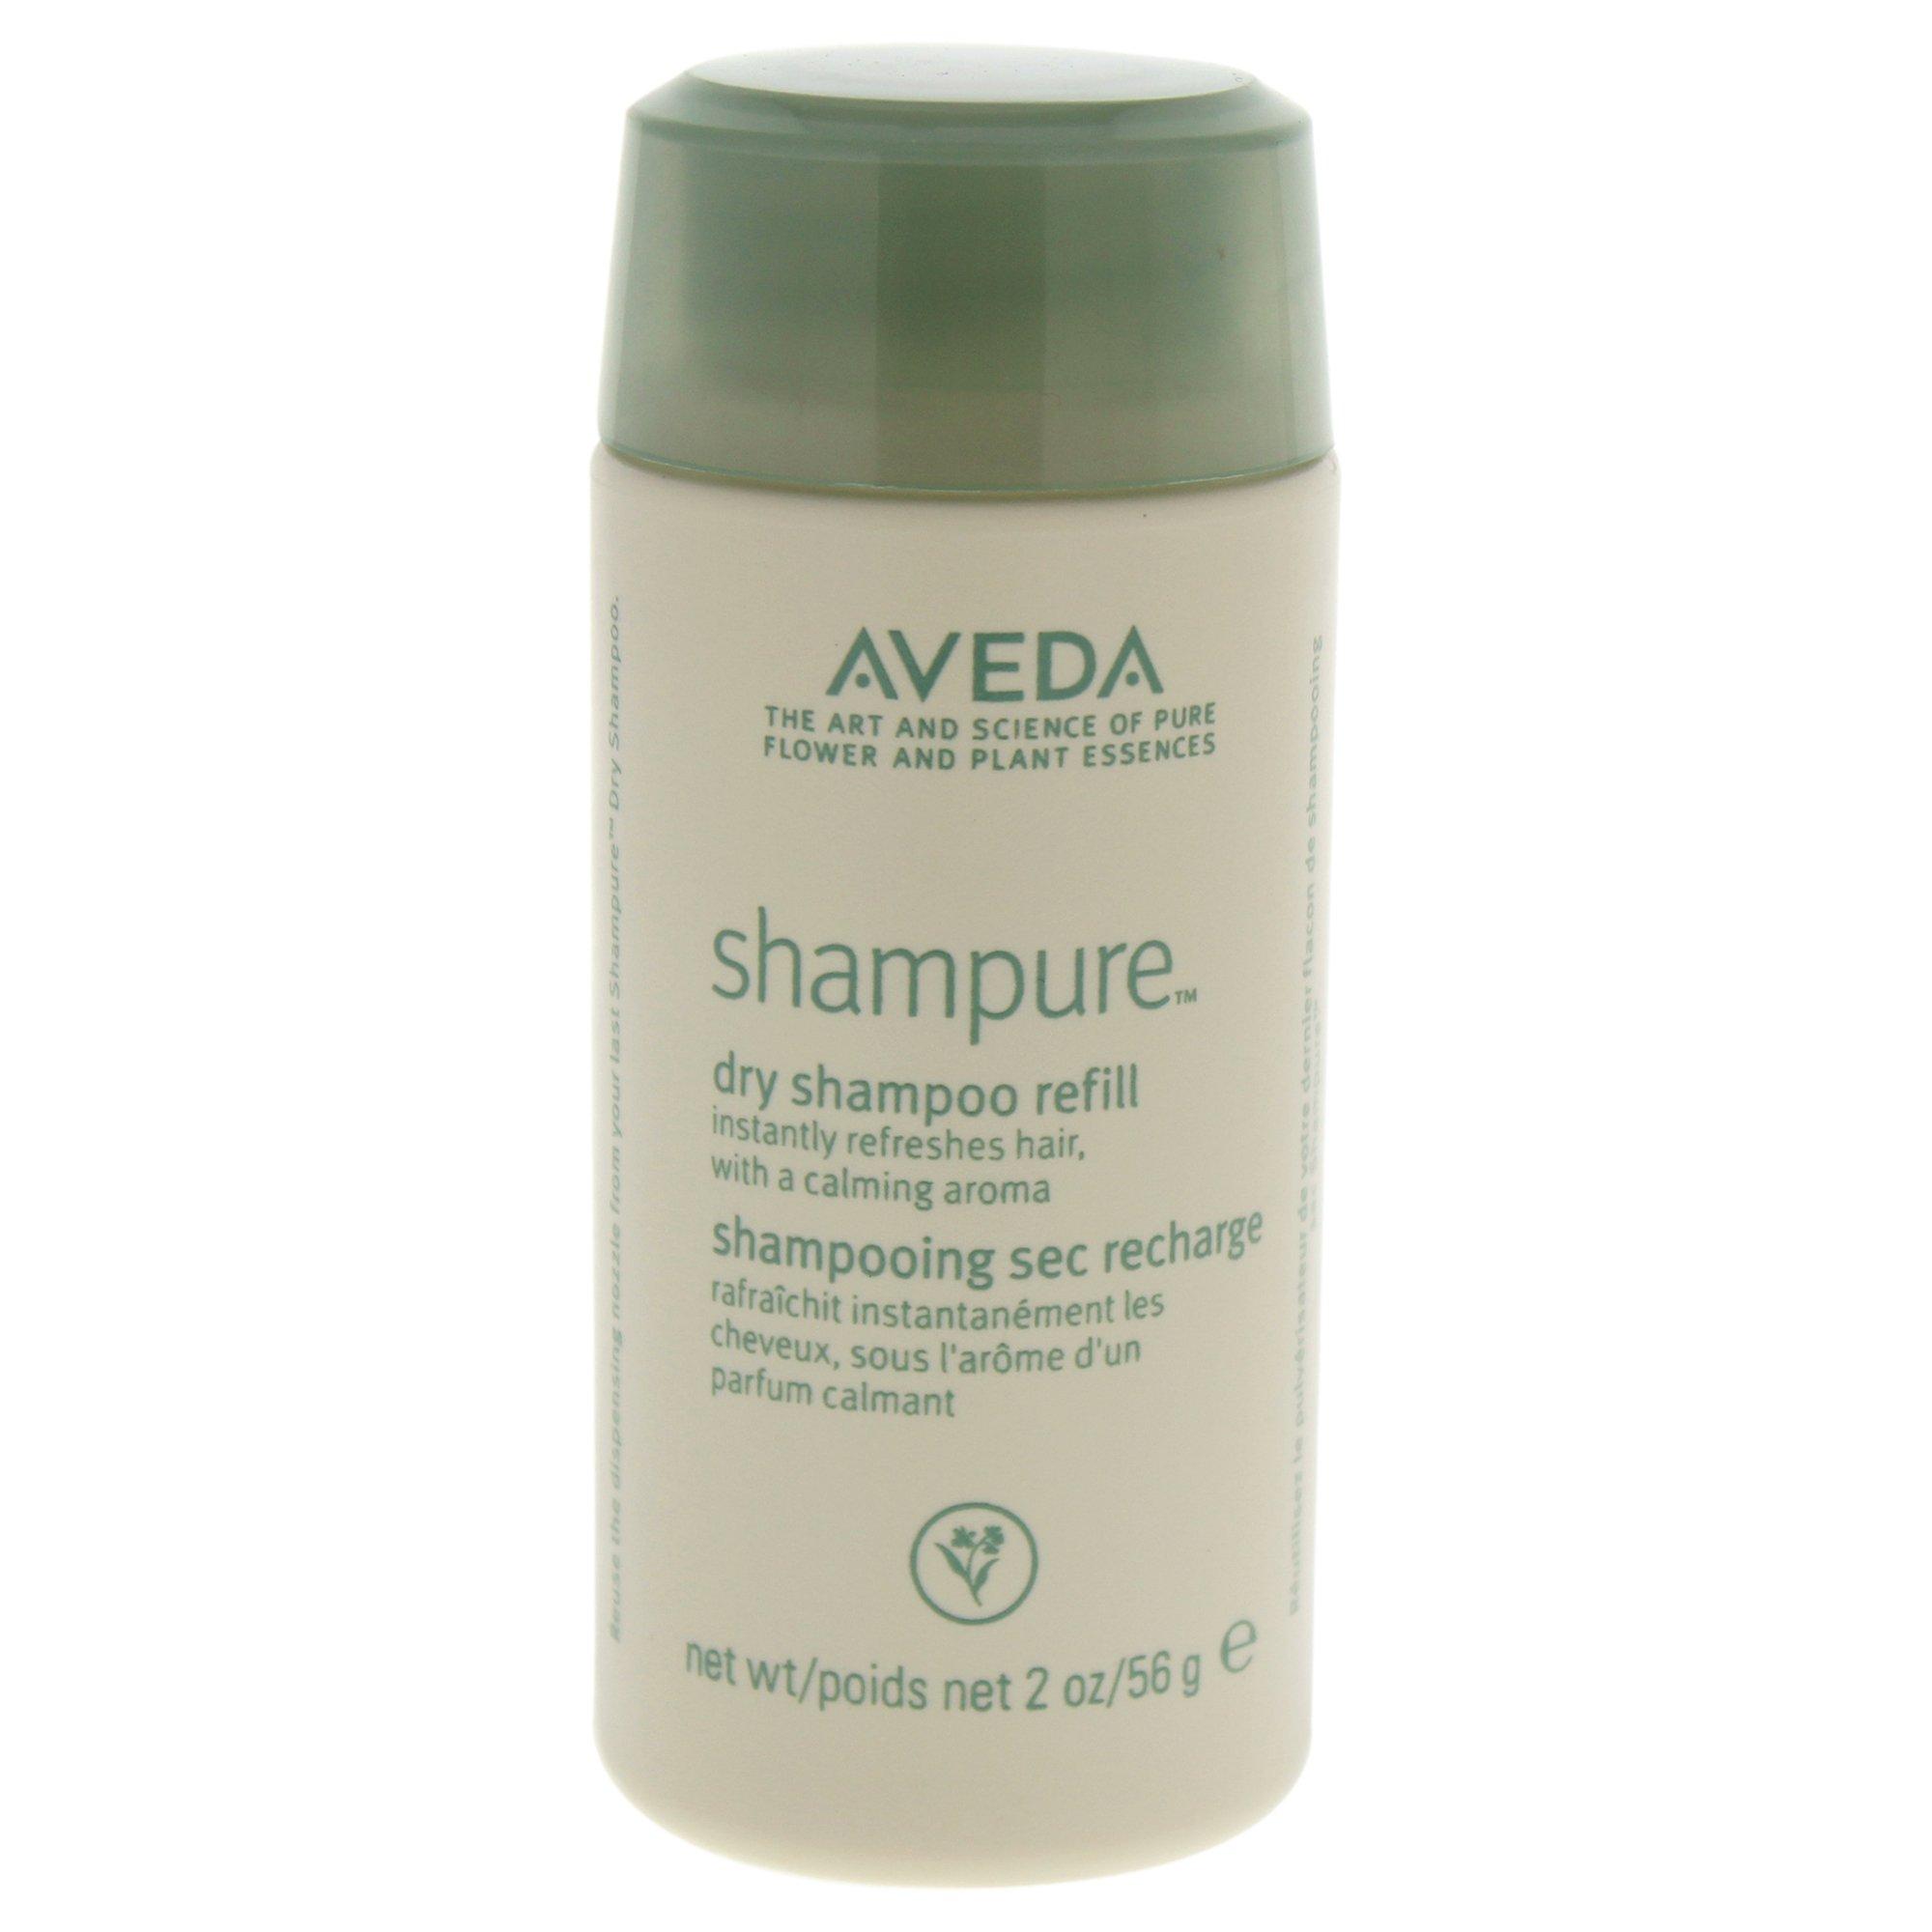 Amazon.com: Aveda Shampure Thermal Dry Conditioner 3.4 oz